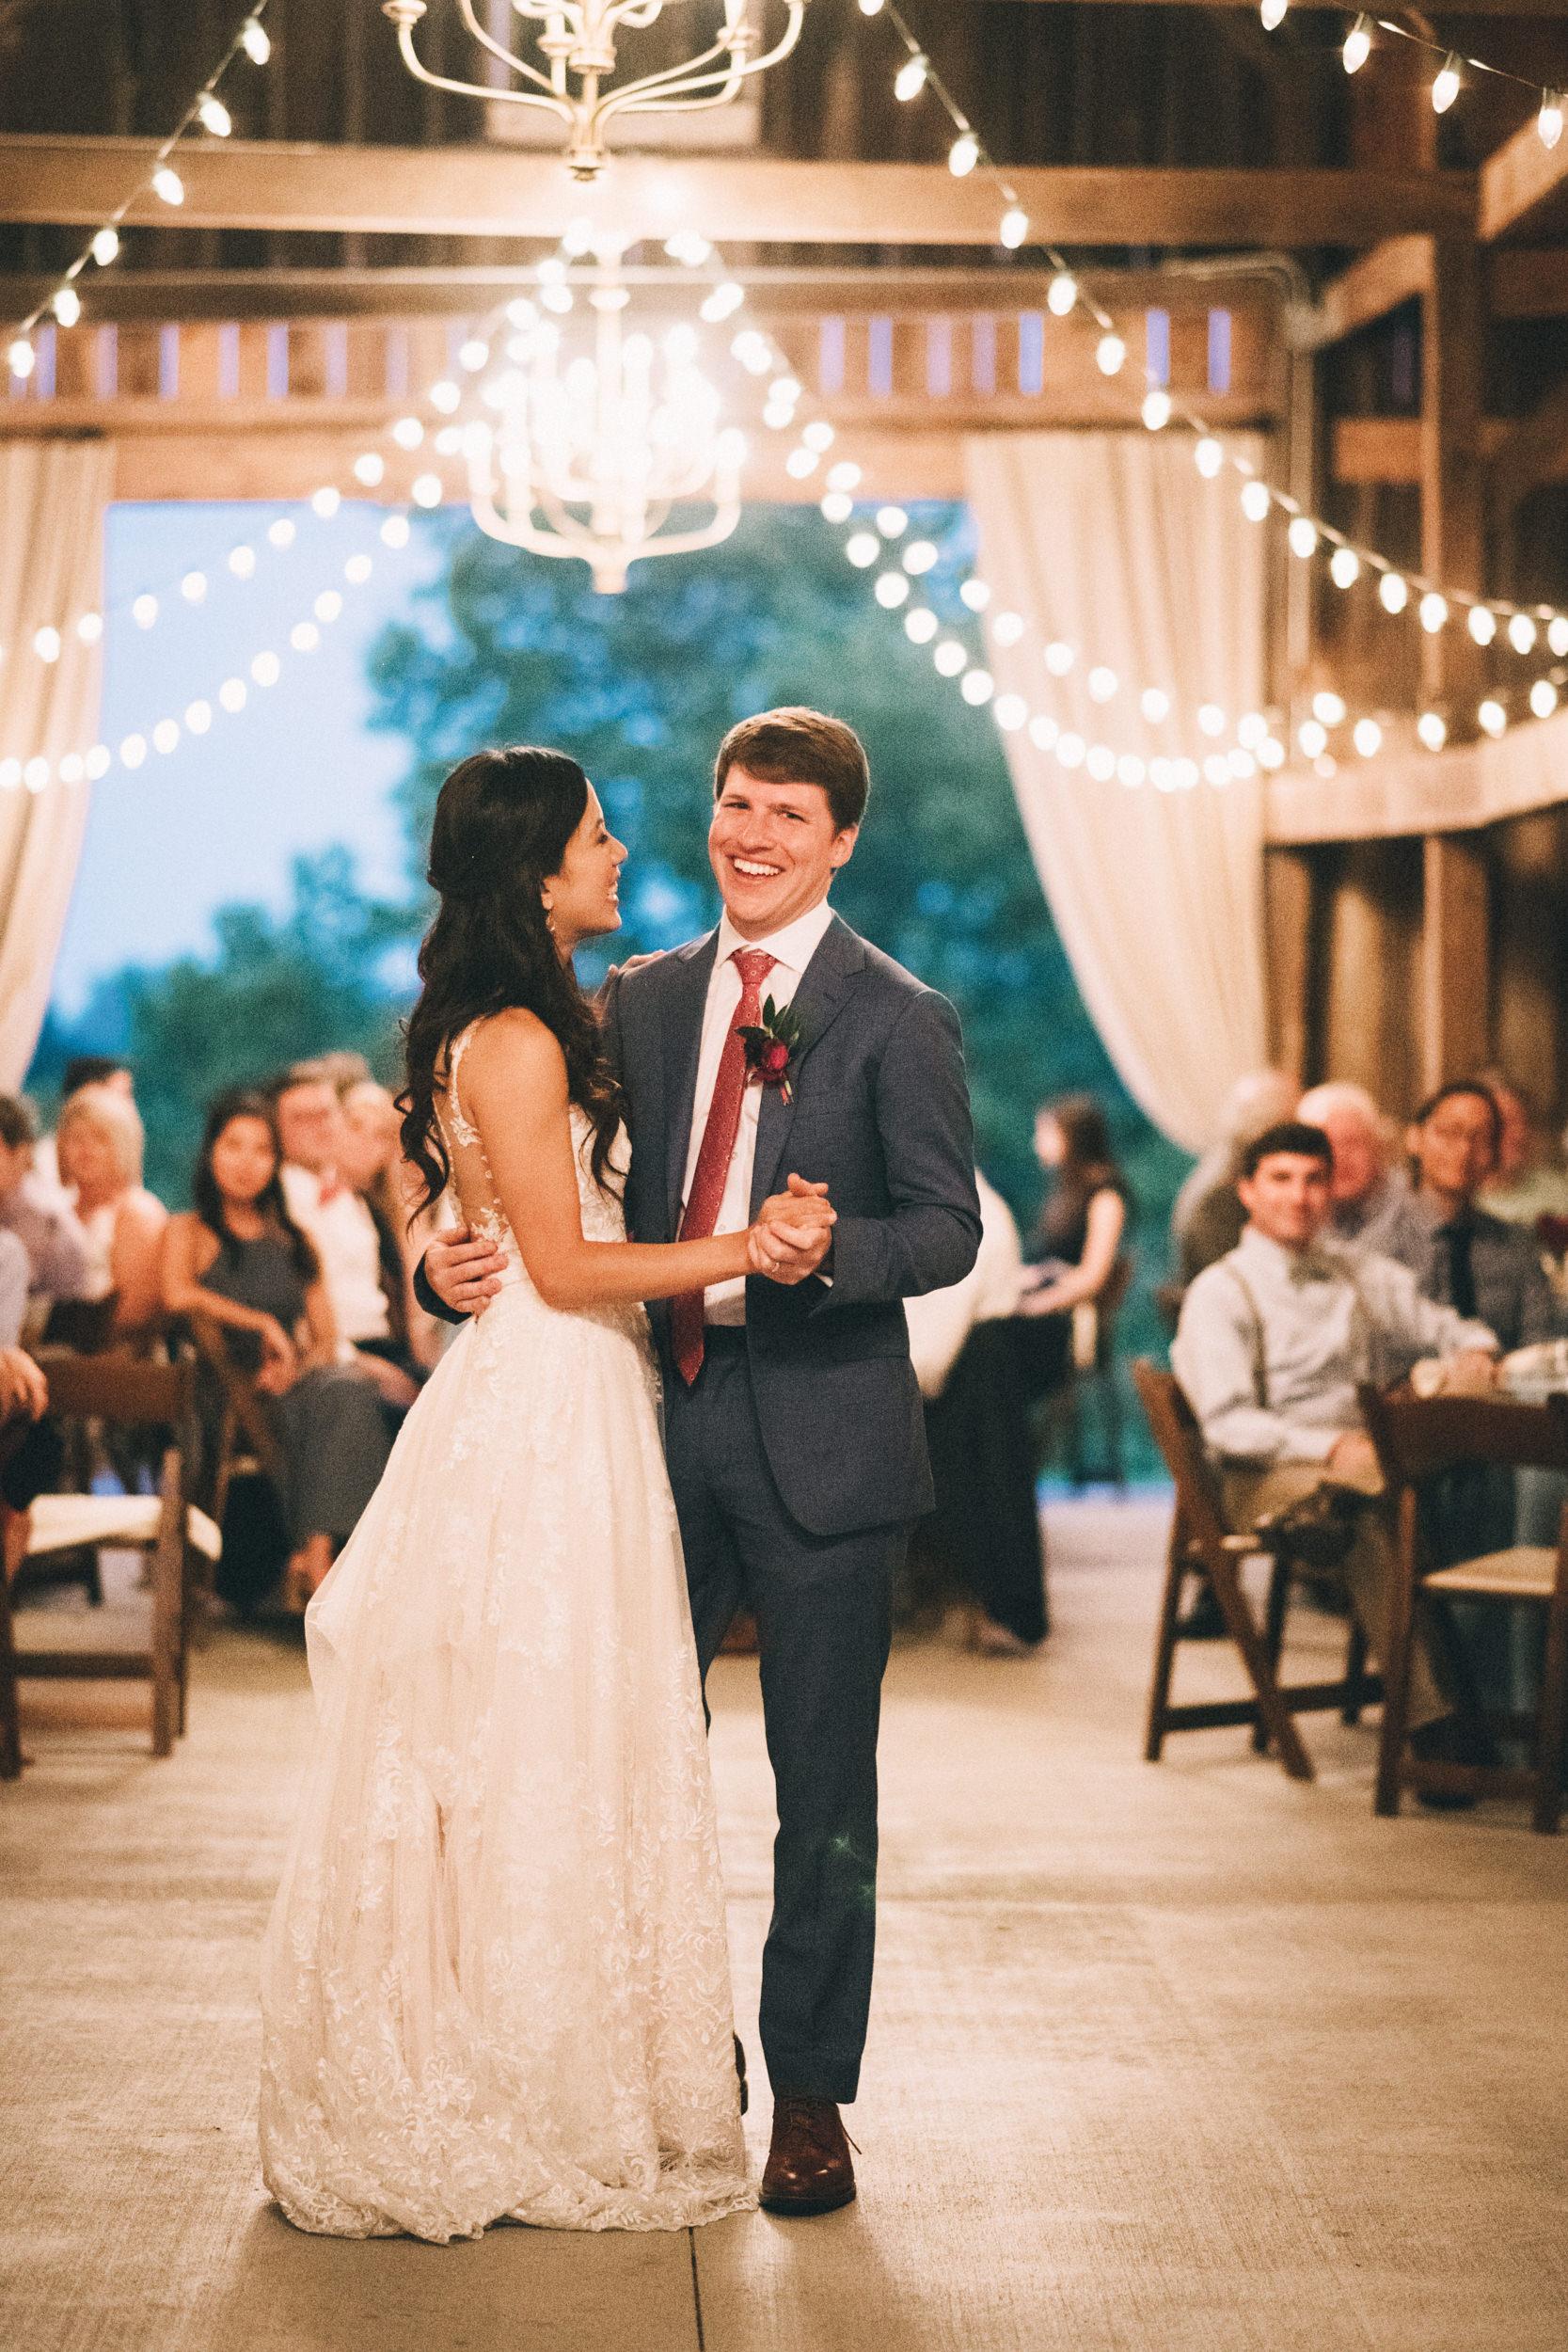 Louisville-Kentucky-Wedding-and-Elopement-Photographer-Sarah-Katherine-Davis-Photography-Summer-Wedding-Warrenwood-Manor-Janice-Quentin-2-3edit.jpg